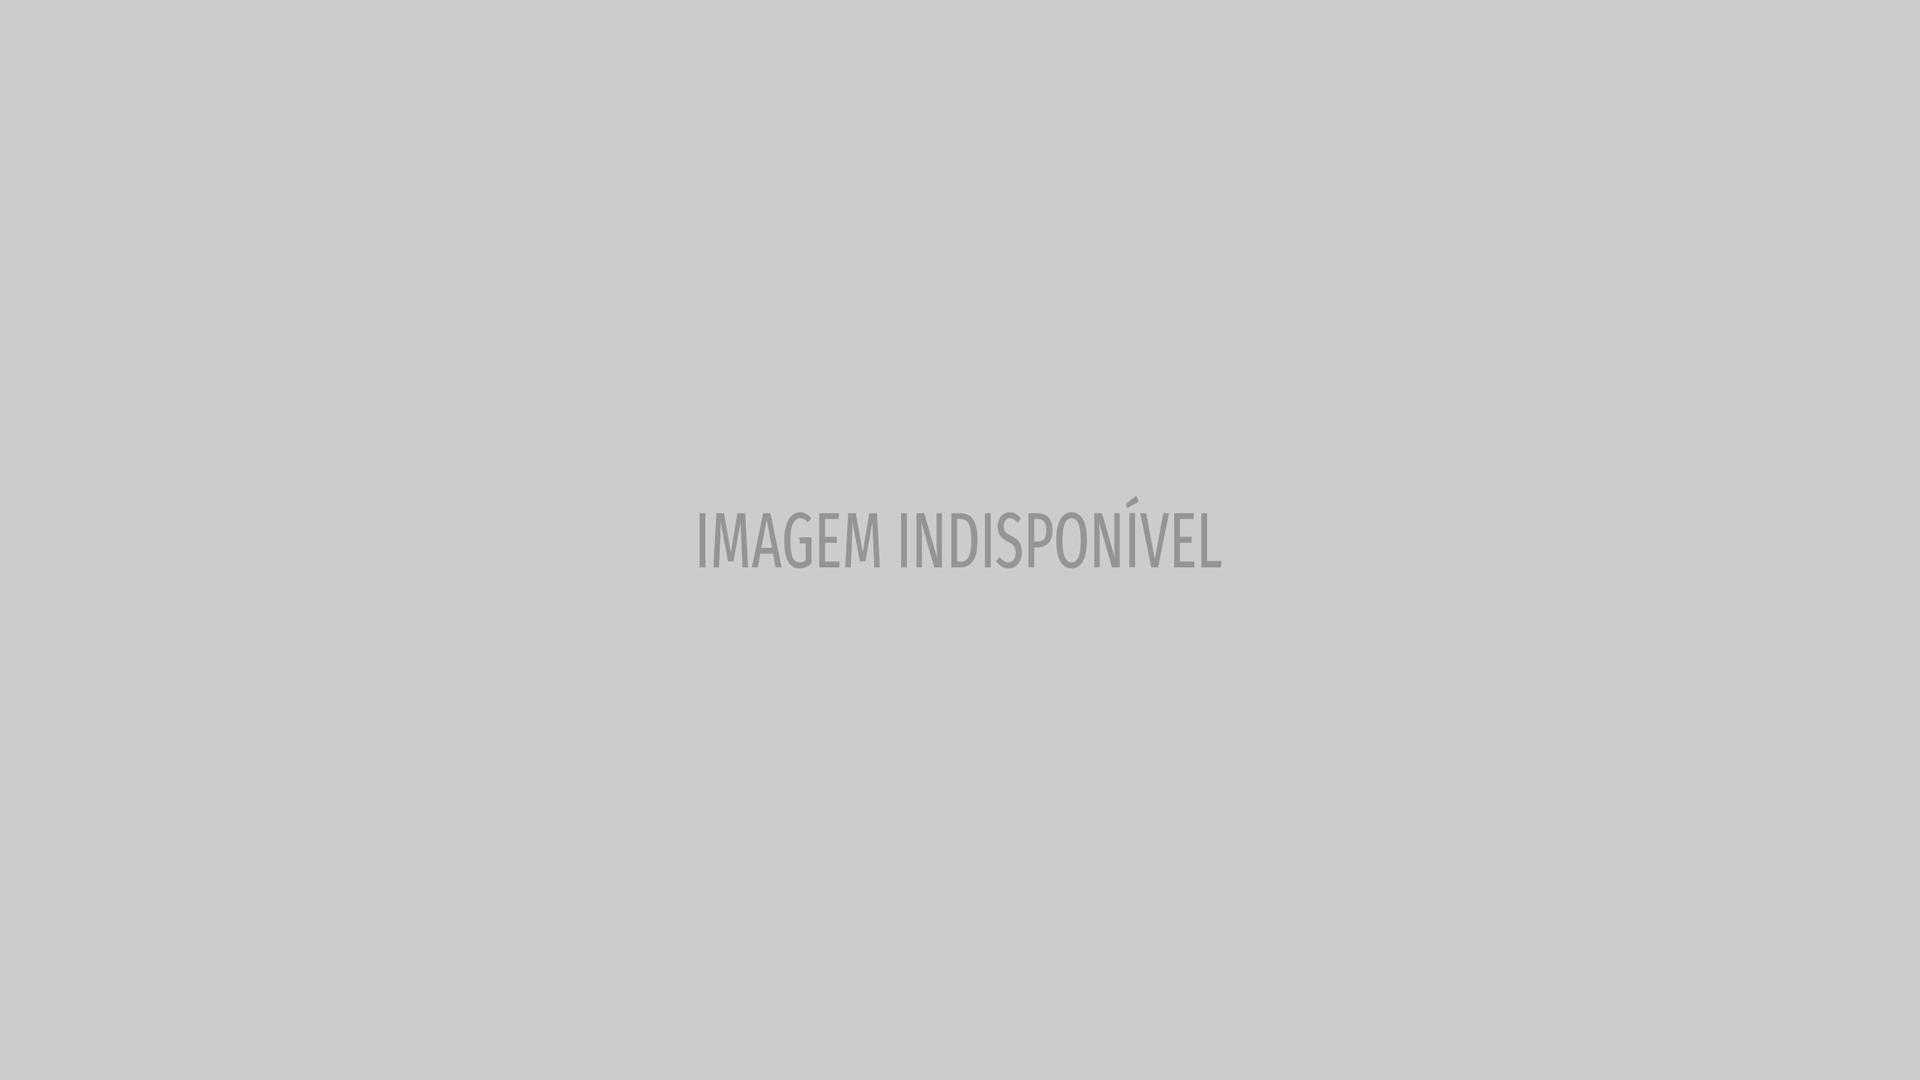 Aos 91 anos, Cid Moreira faz tratamento de pele e surge de máscara